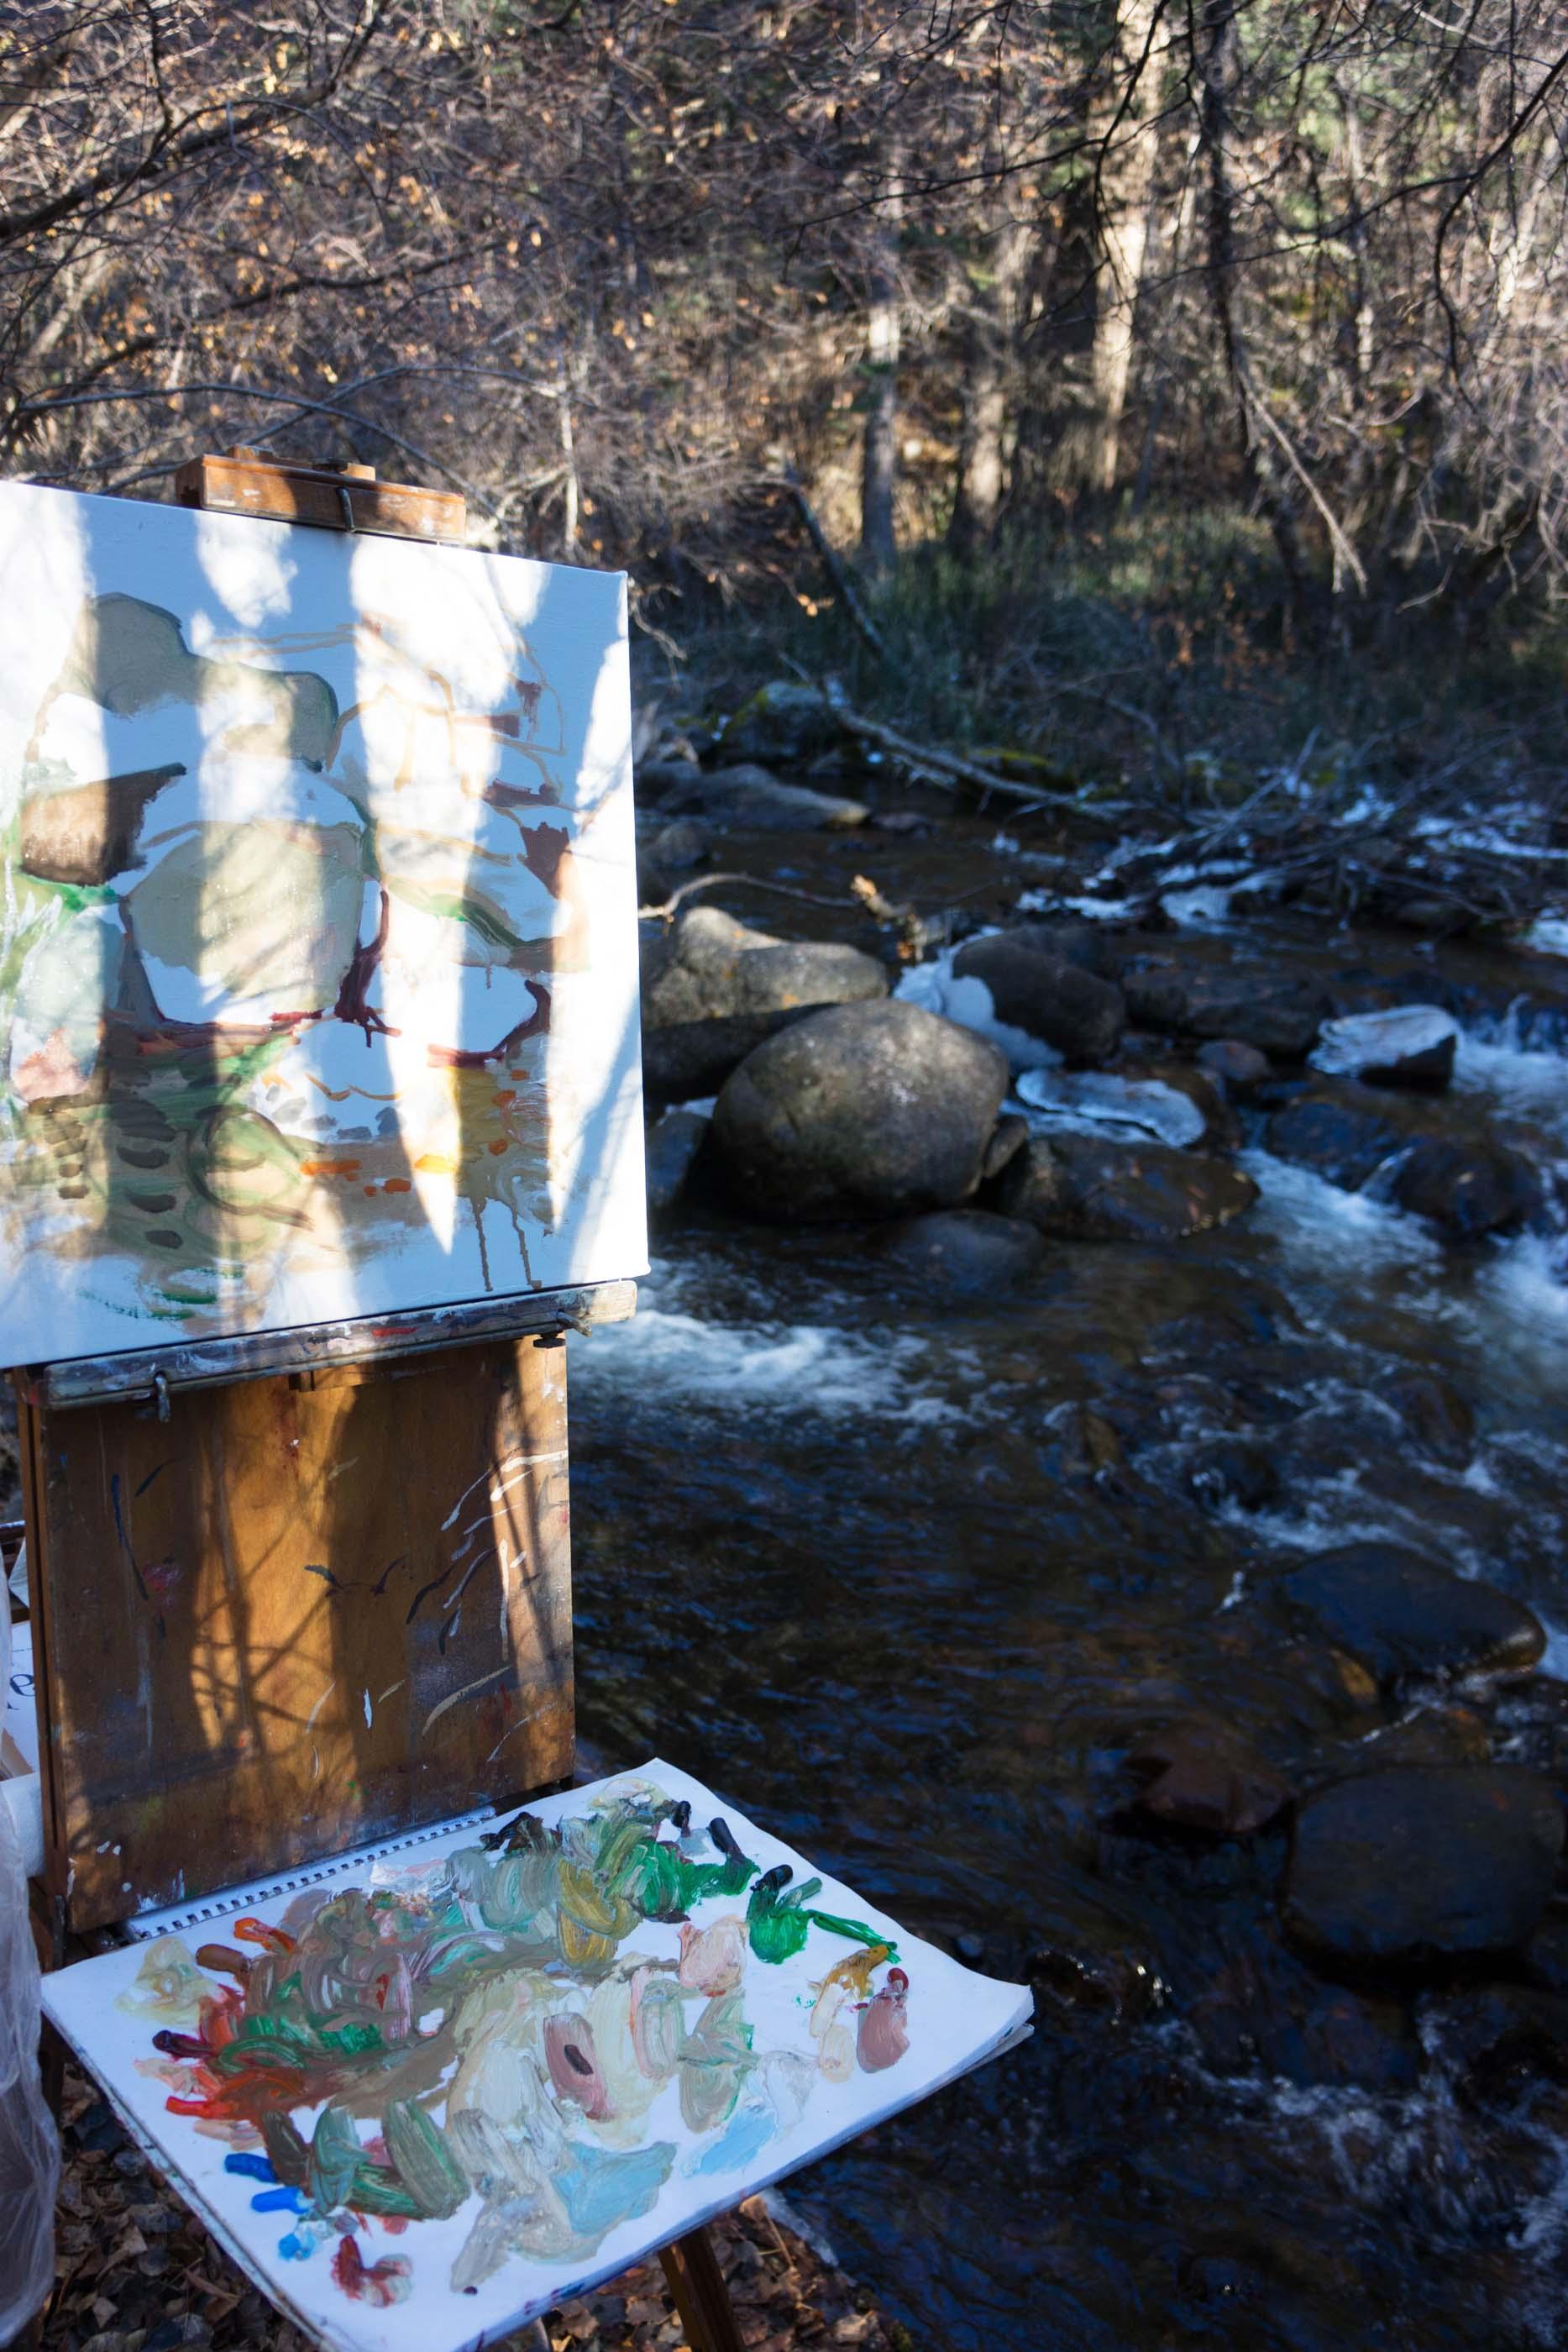 site-11-11-13 LR RAW n. crestone creek-scene.jpg